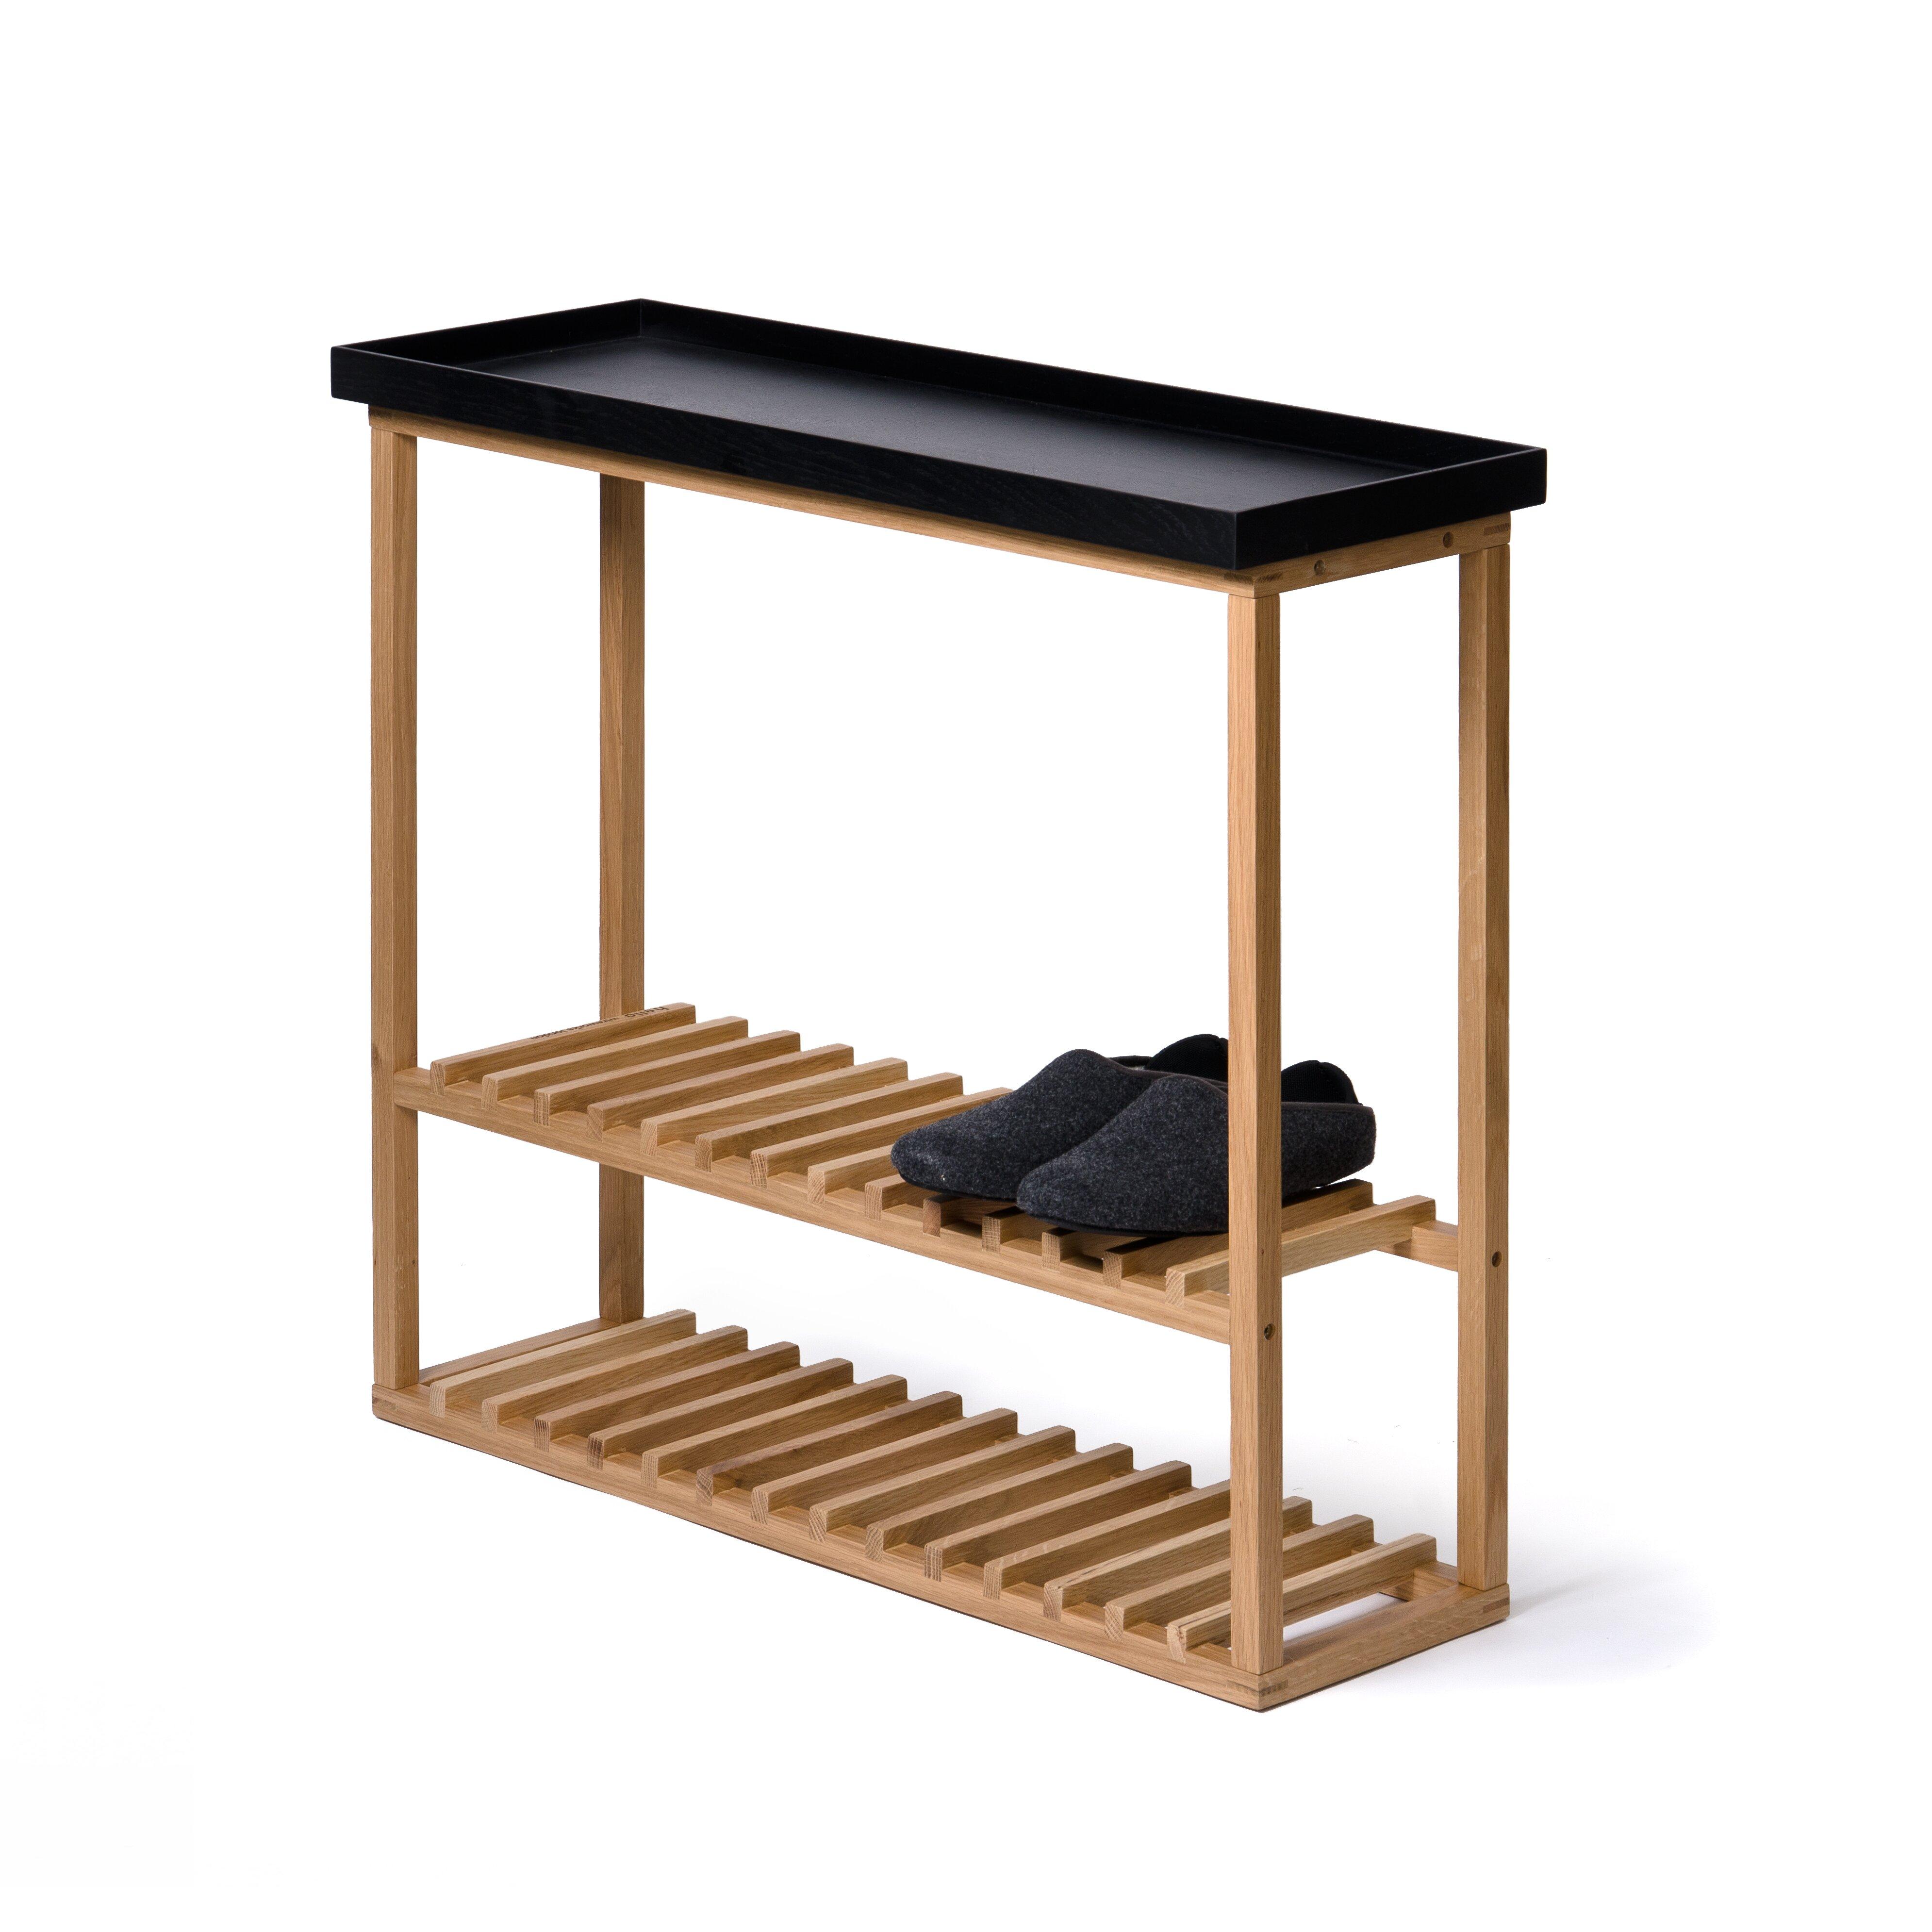 Belfry phillipa shoe storage table reviews wayfair uk - Small storage table for bathroom ...